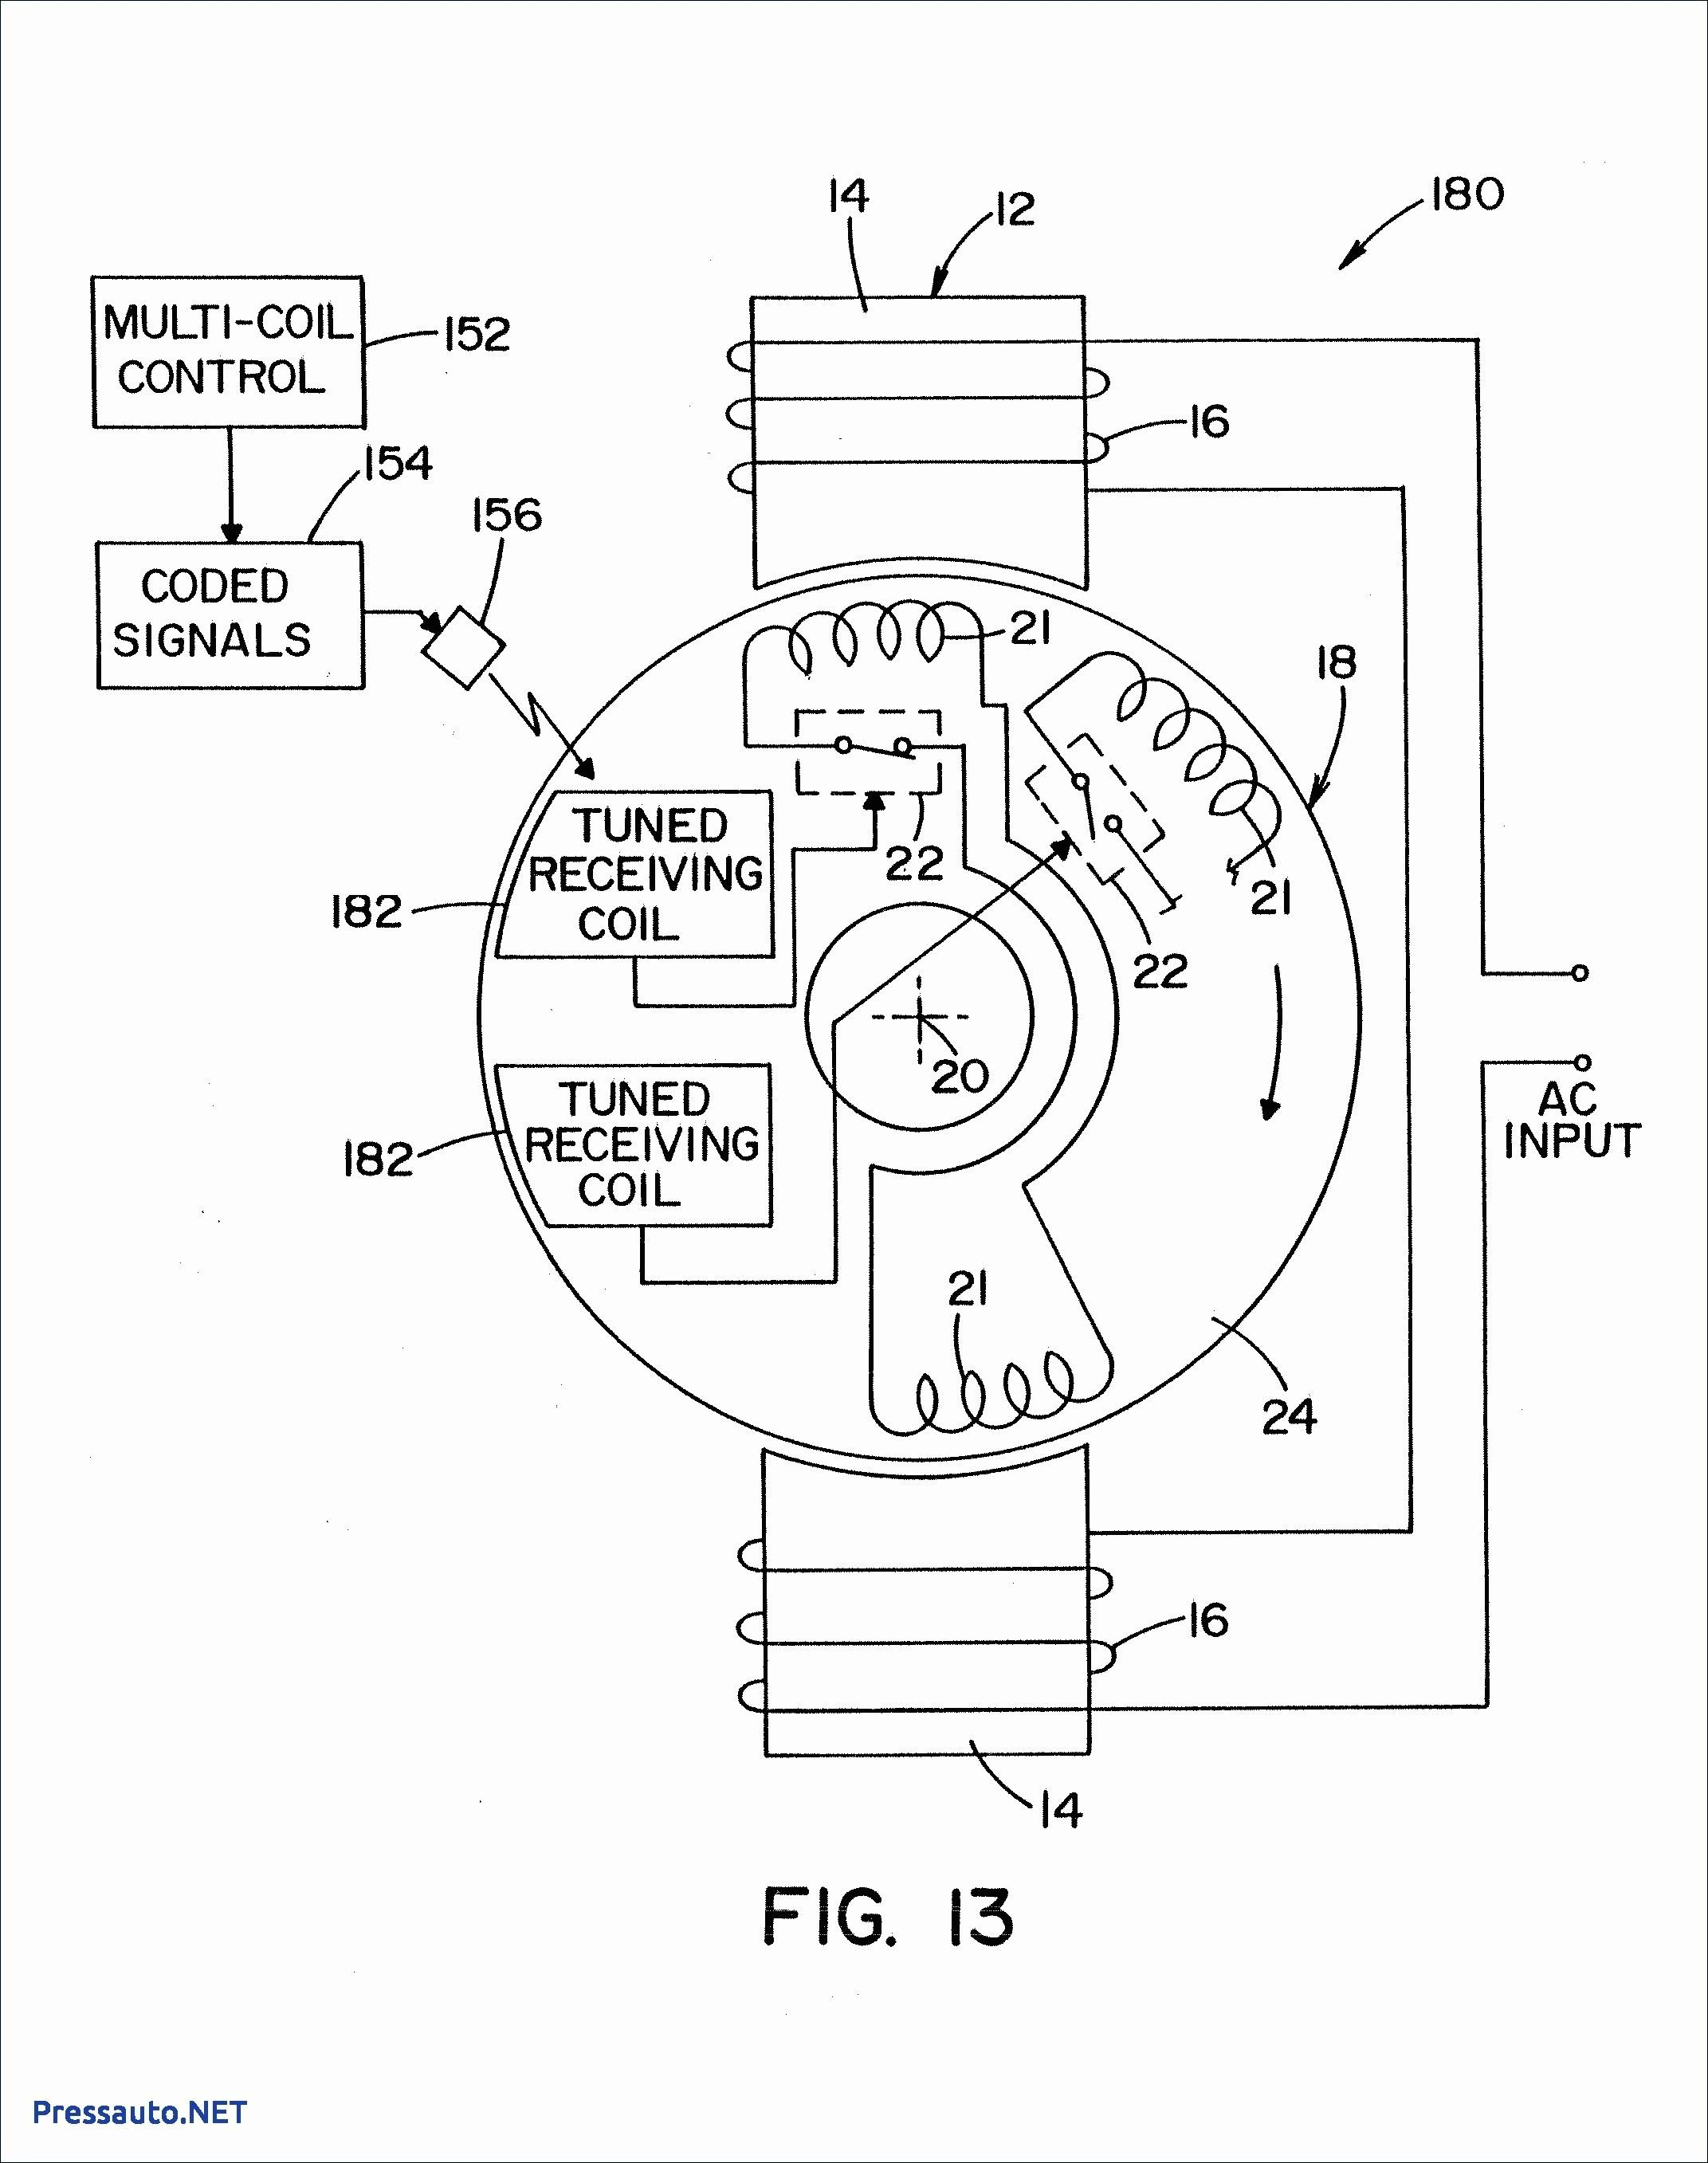 Fantastic Fan Wiring Diagram | Wiring Diagram - Fantastic Fan Wiring Diagram